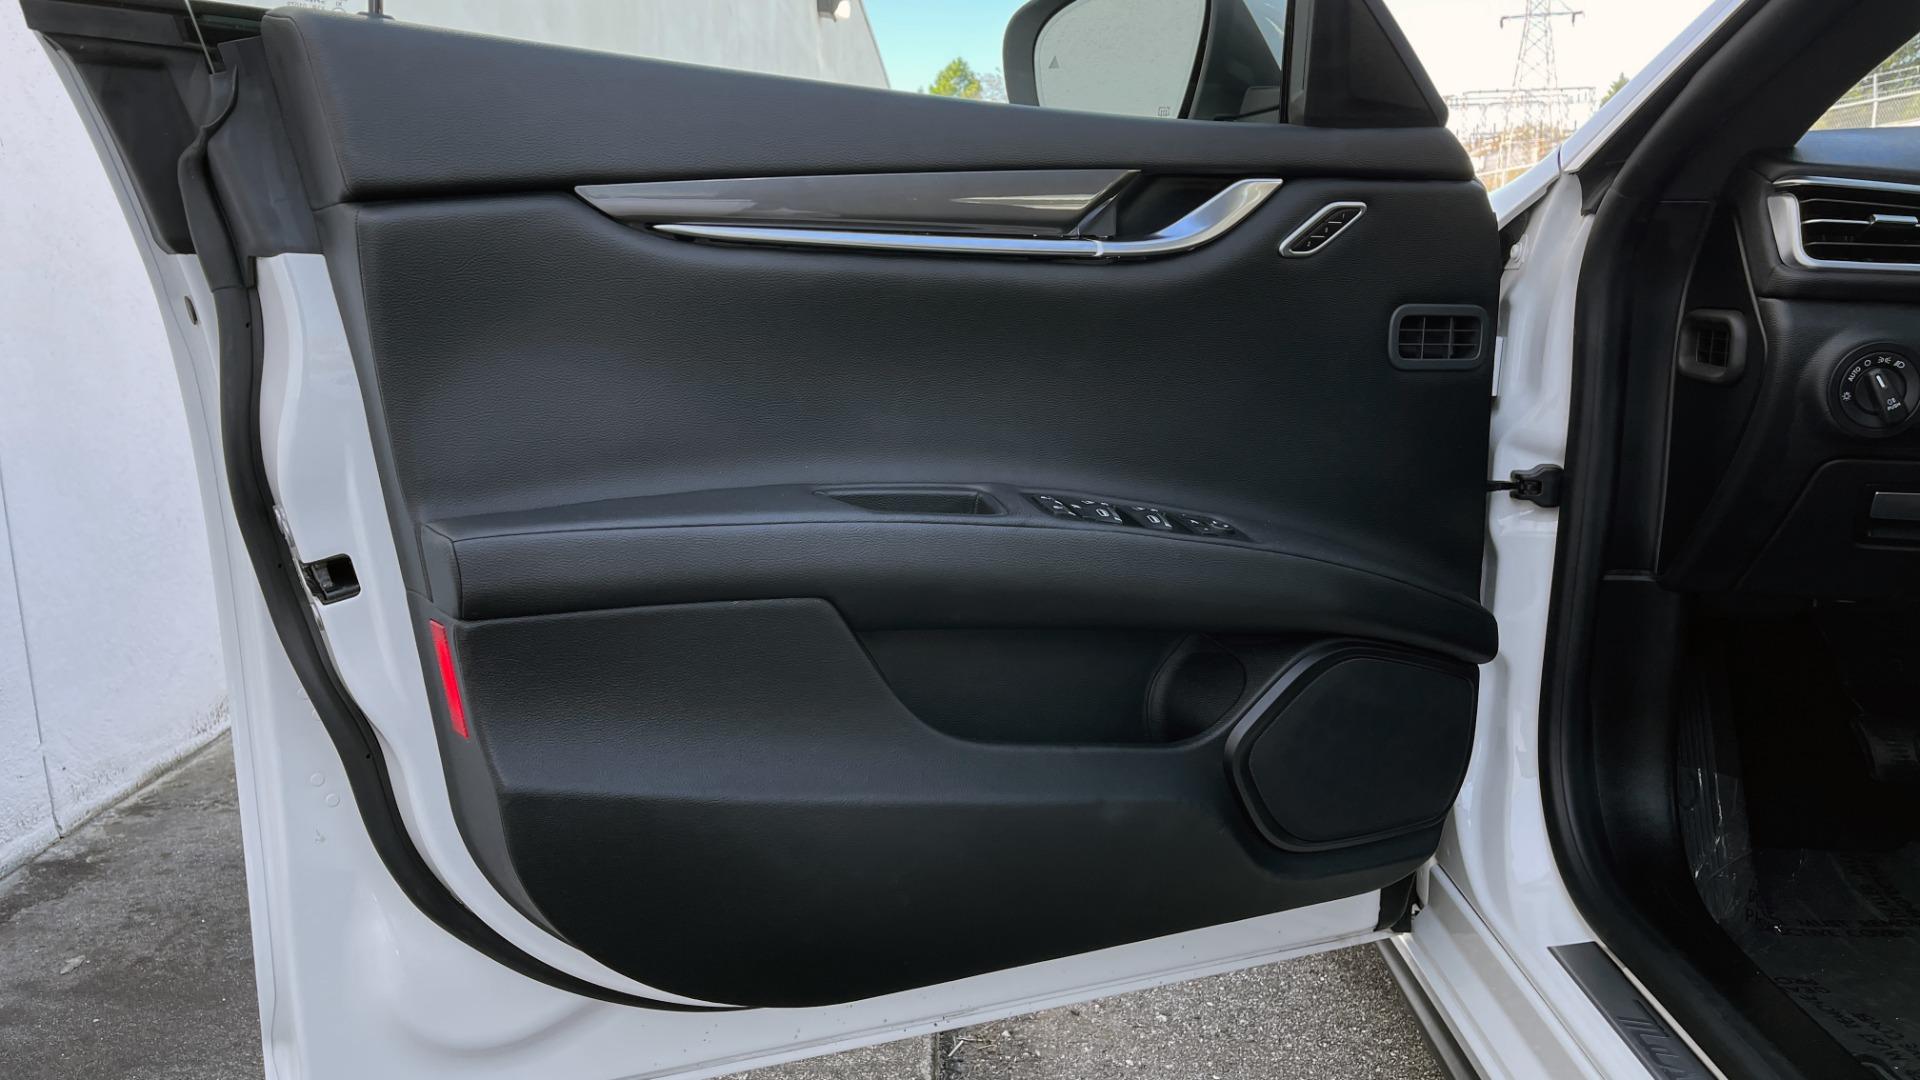 Used 2018 Maserati GHIBLI SEDAN / RWD / 3.0L V6 / SUNROOF / NAV / REARVIEW for sale $42,995 at Formula Imports in Charlotte NC 28227 27